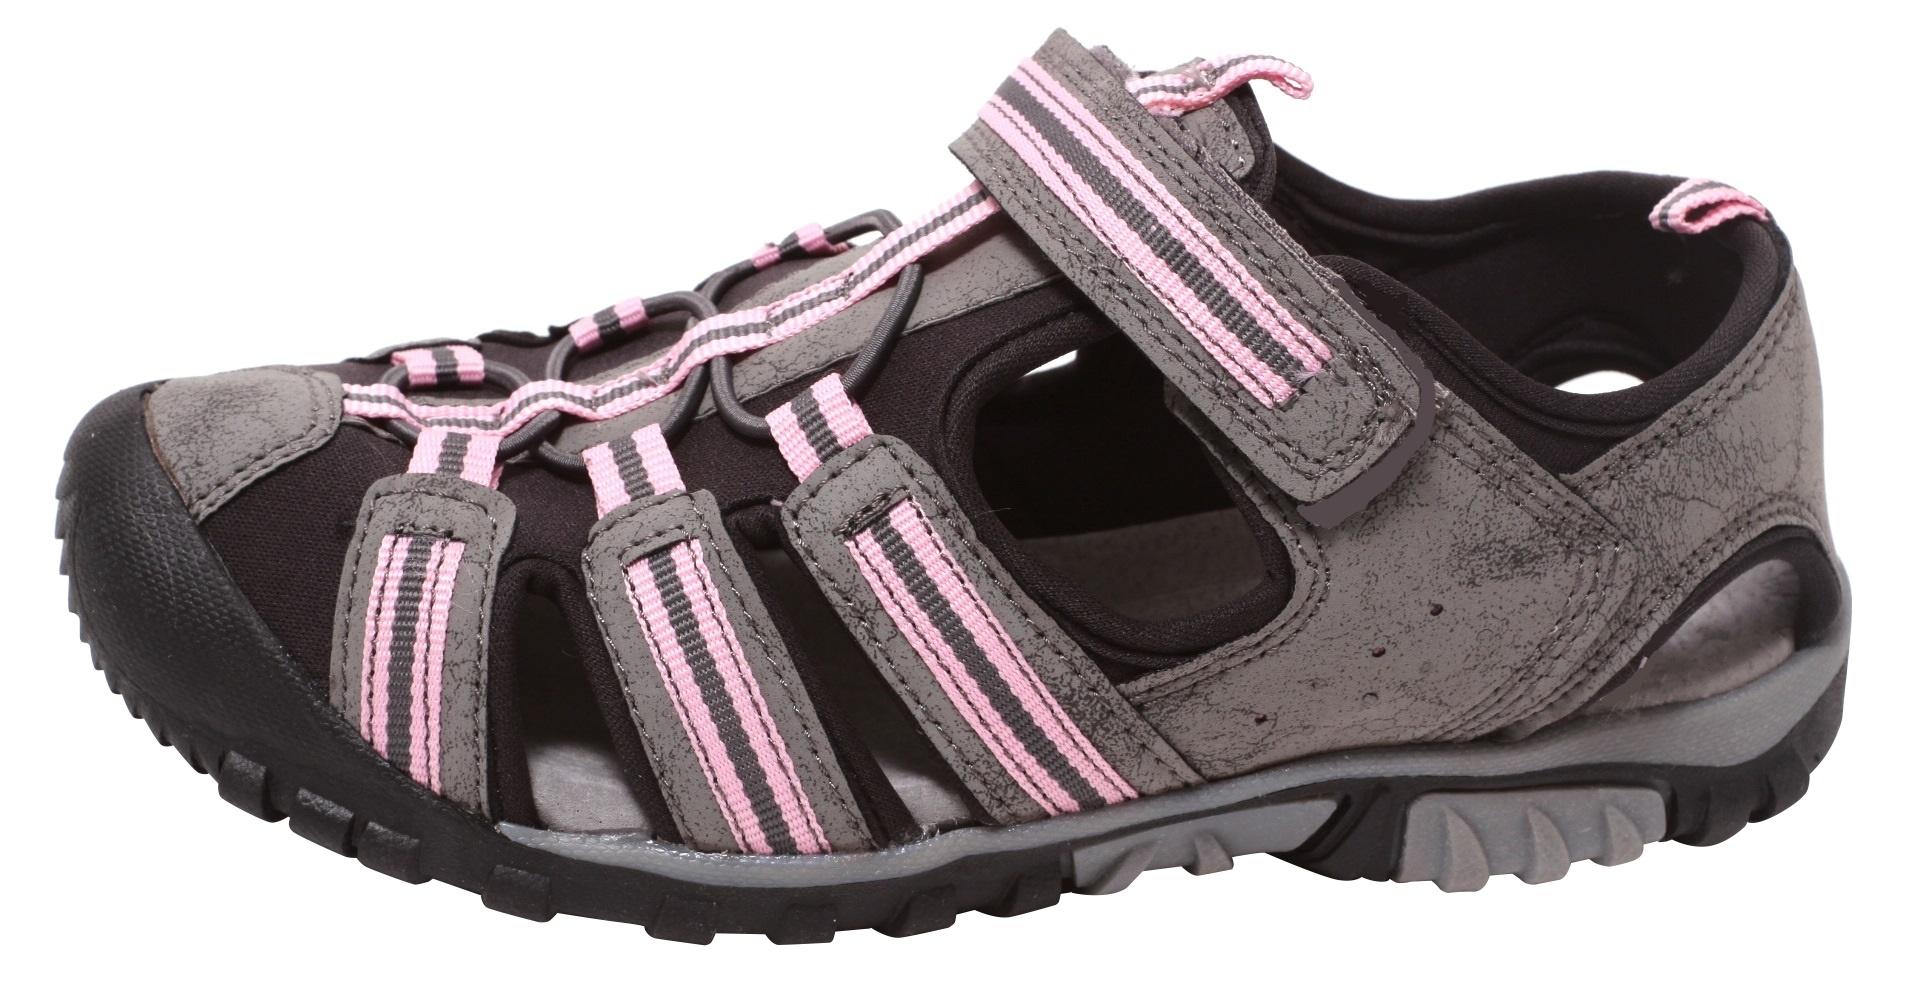 Trekking Gr 34 Mädchen 29 Outdoor Sandale Sommersandale Details Schuhe Rosa Zu Kinder Sport xroedCB